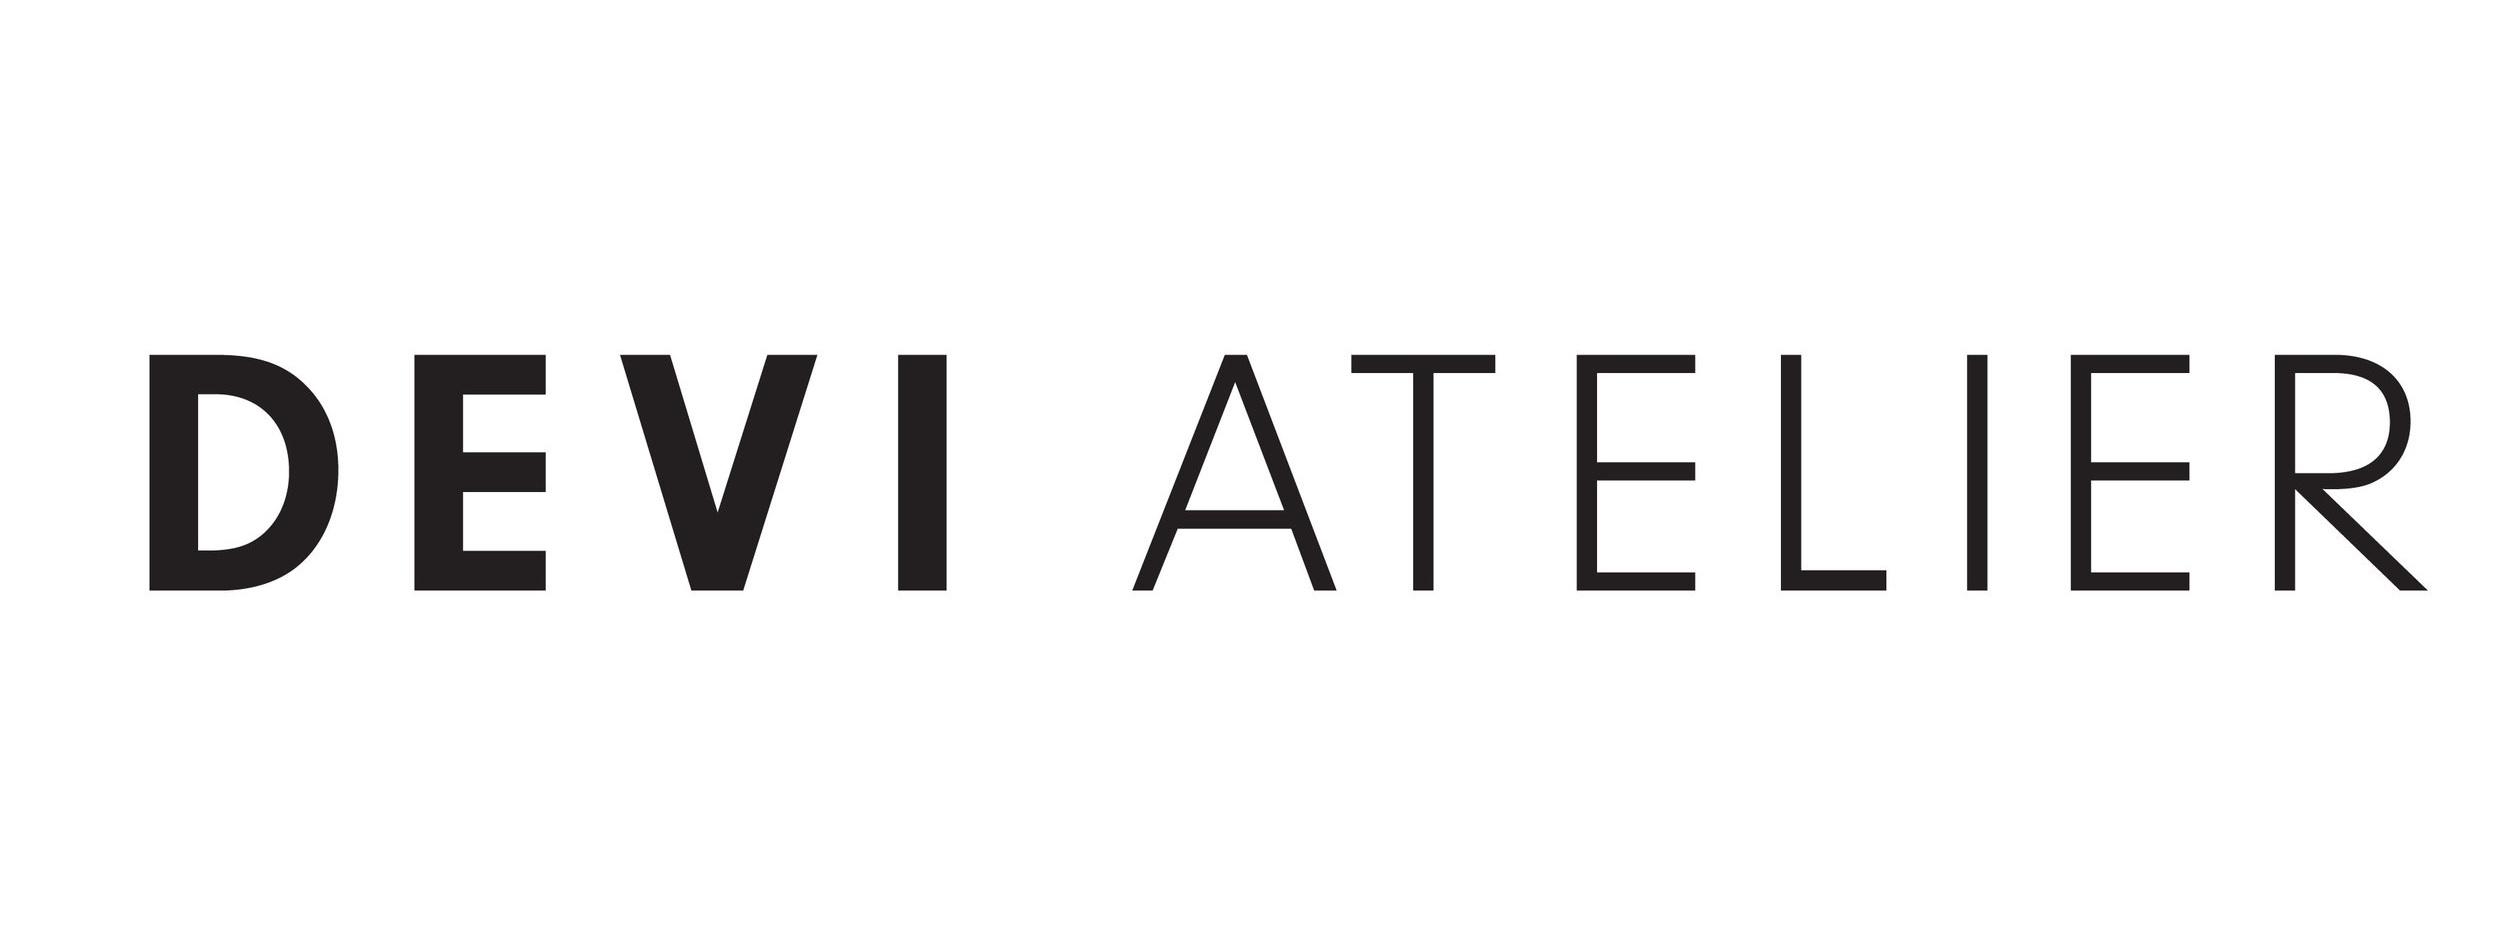 DeviAtelier-Logo-01-09.jpg